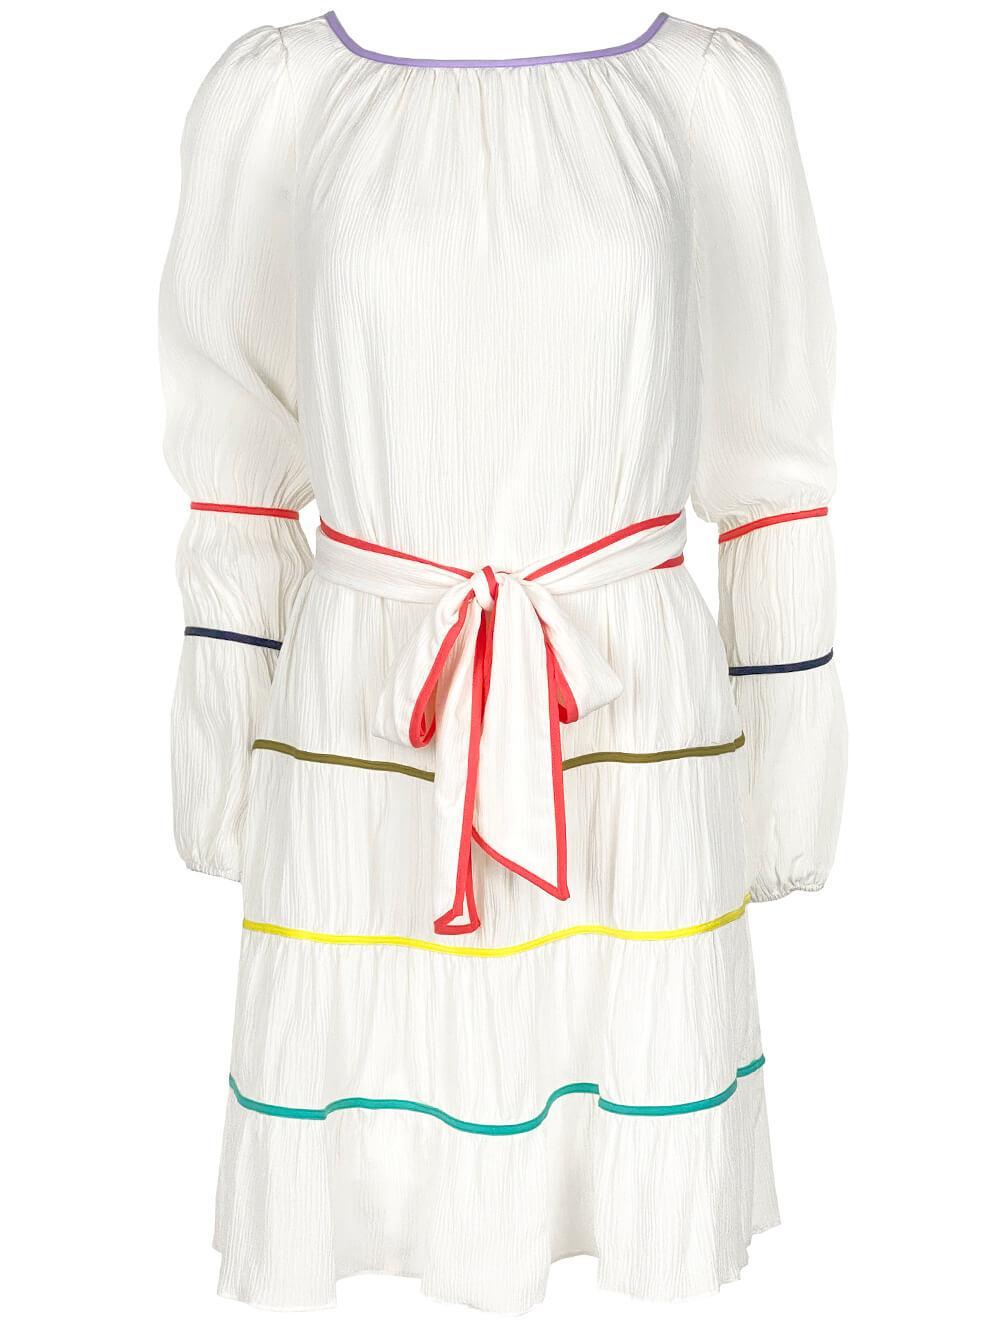 Suni Dress Item # 2S5-68-503B